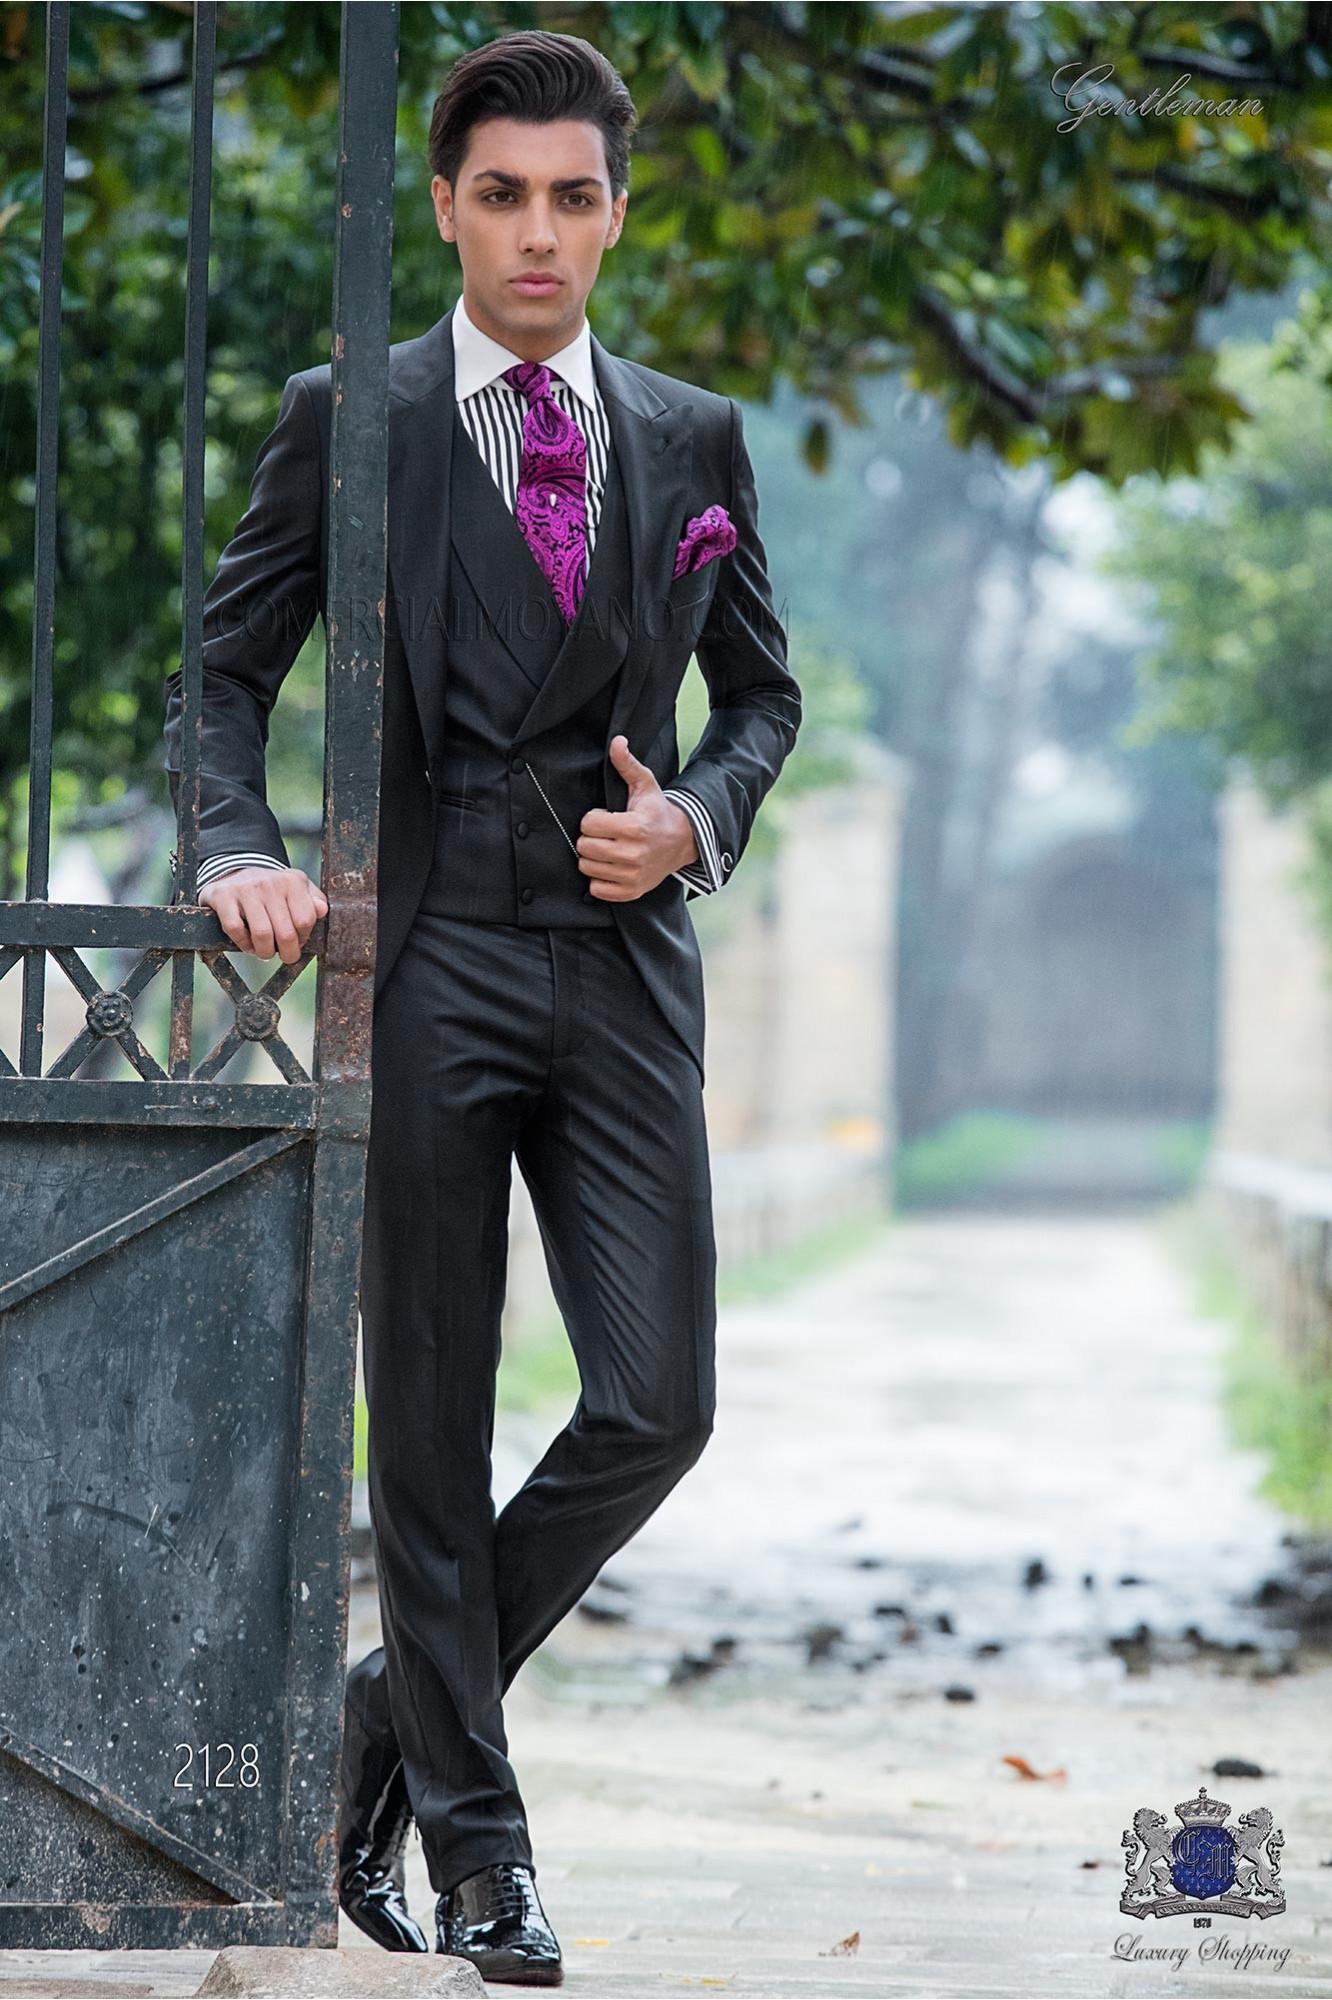 Traje de novio negro italiano moderno. Modelo con solapa de punta y 1 botón.